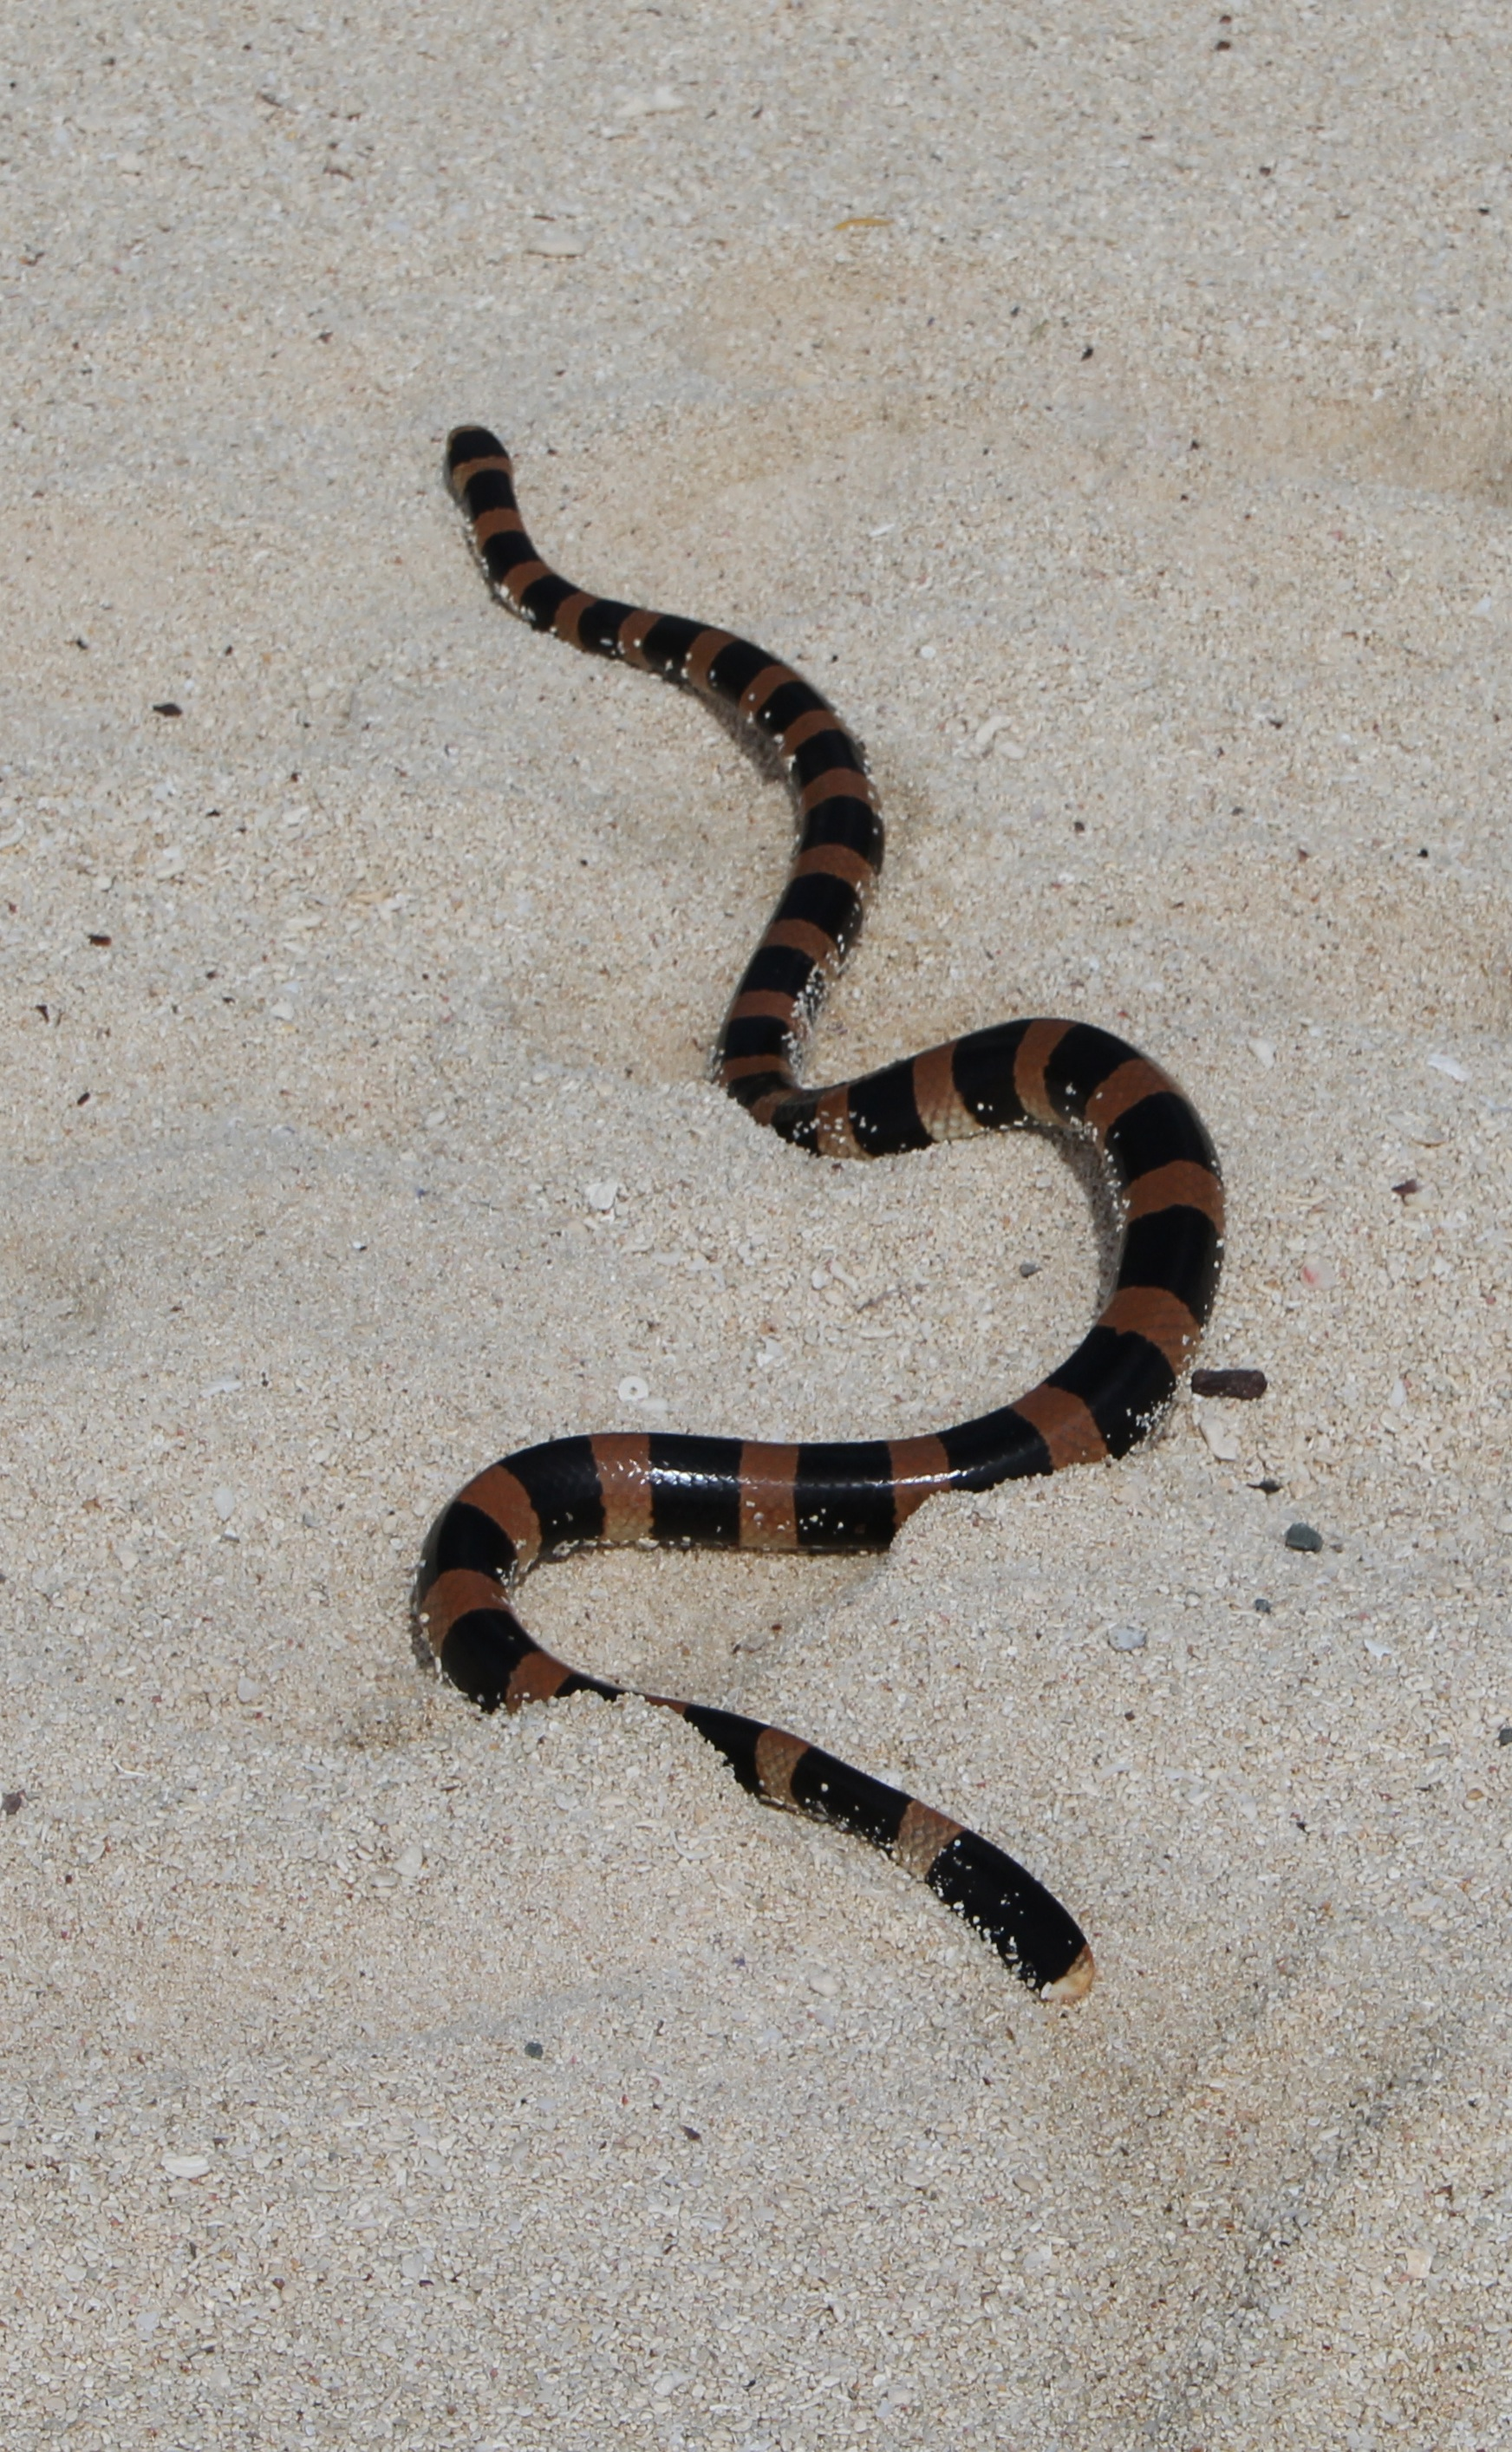 snake - photo #16